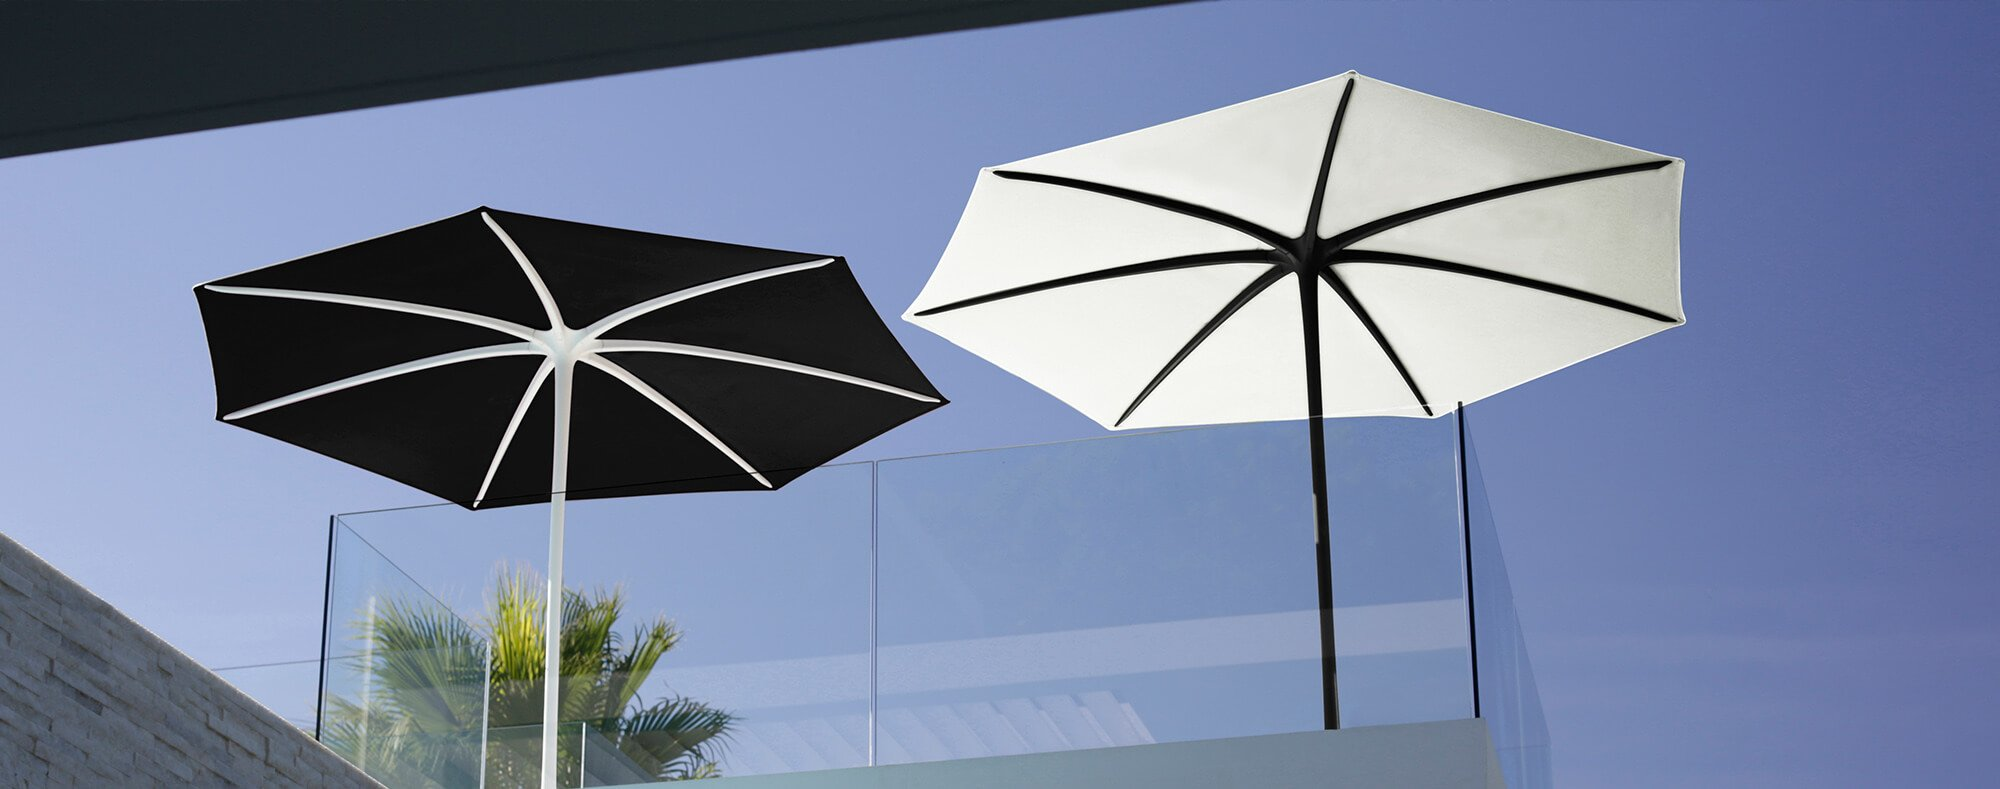 Palma luxury parasol